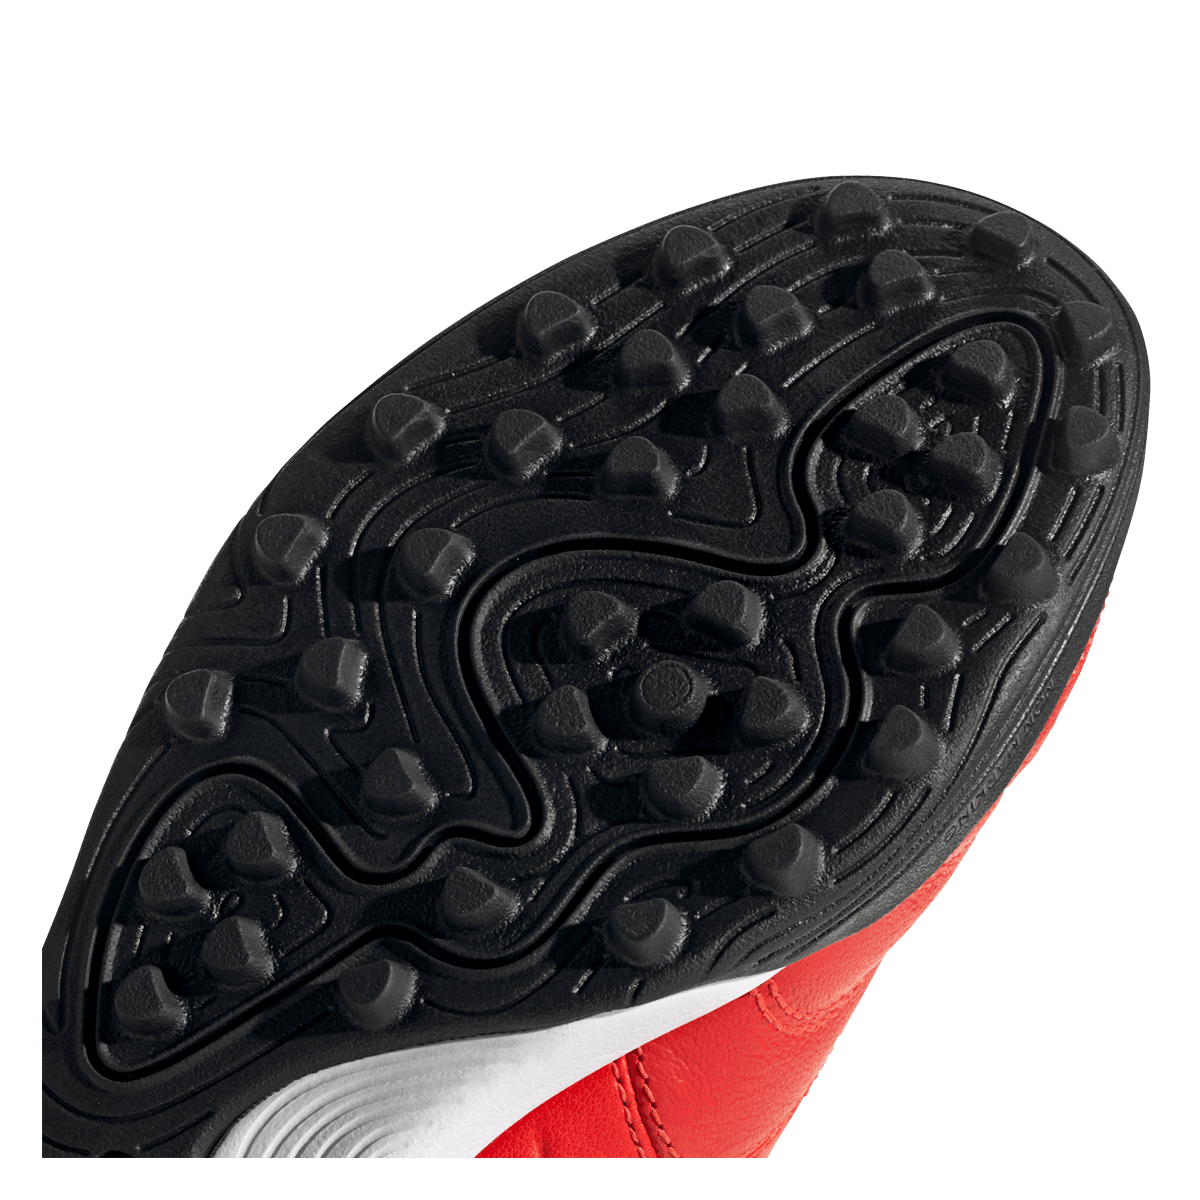 adidas voetbalschoenen Copa 20.3 TF kunstgras roodzwart